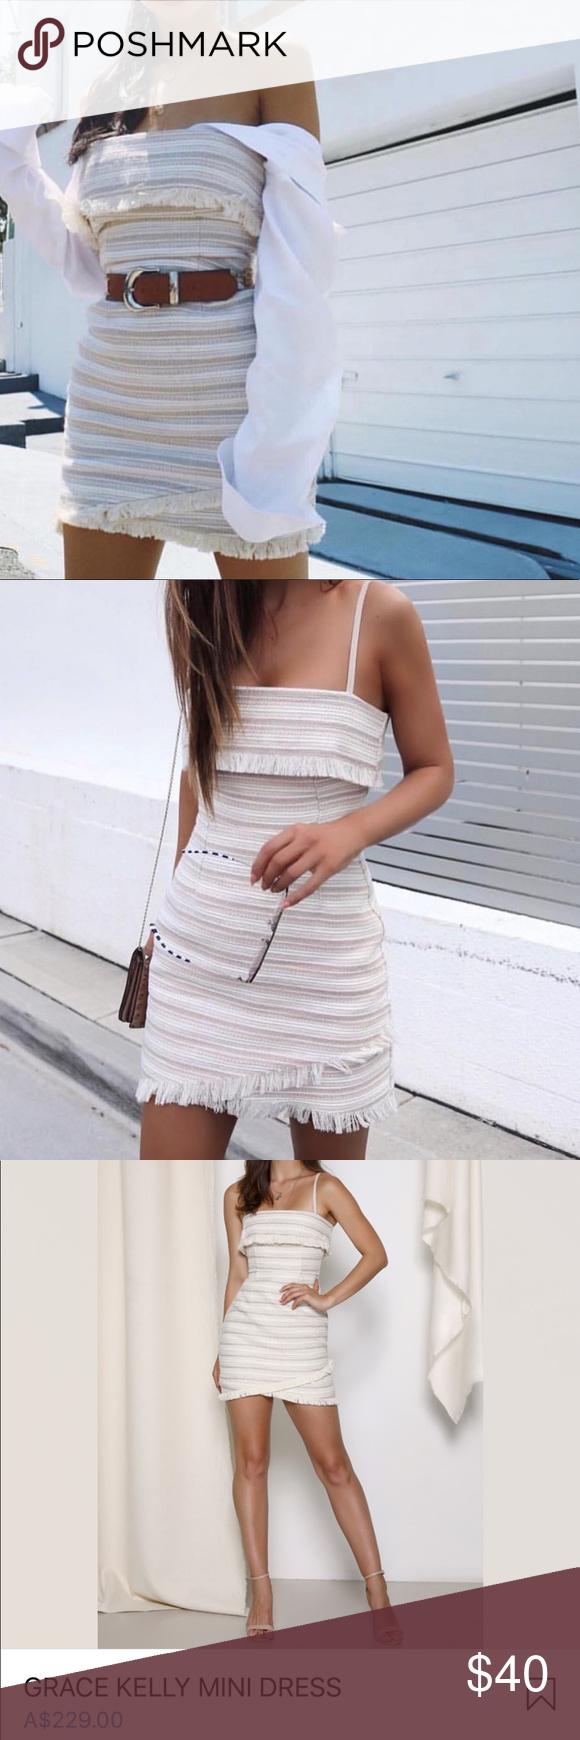 acaddabec7 Mini dress New with tags Size Xs prem the label Dresses Mini